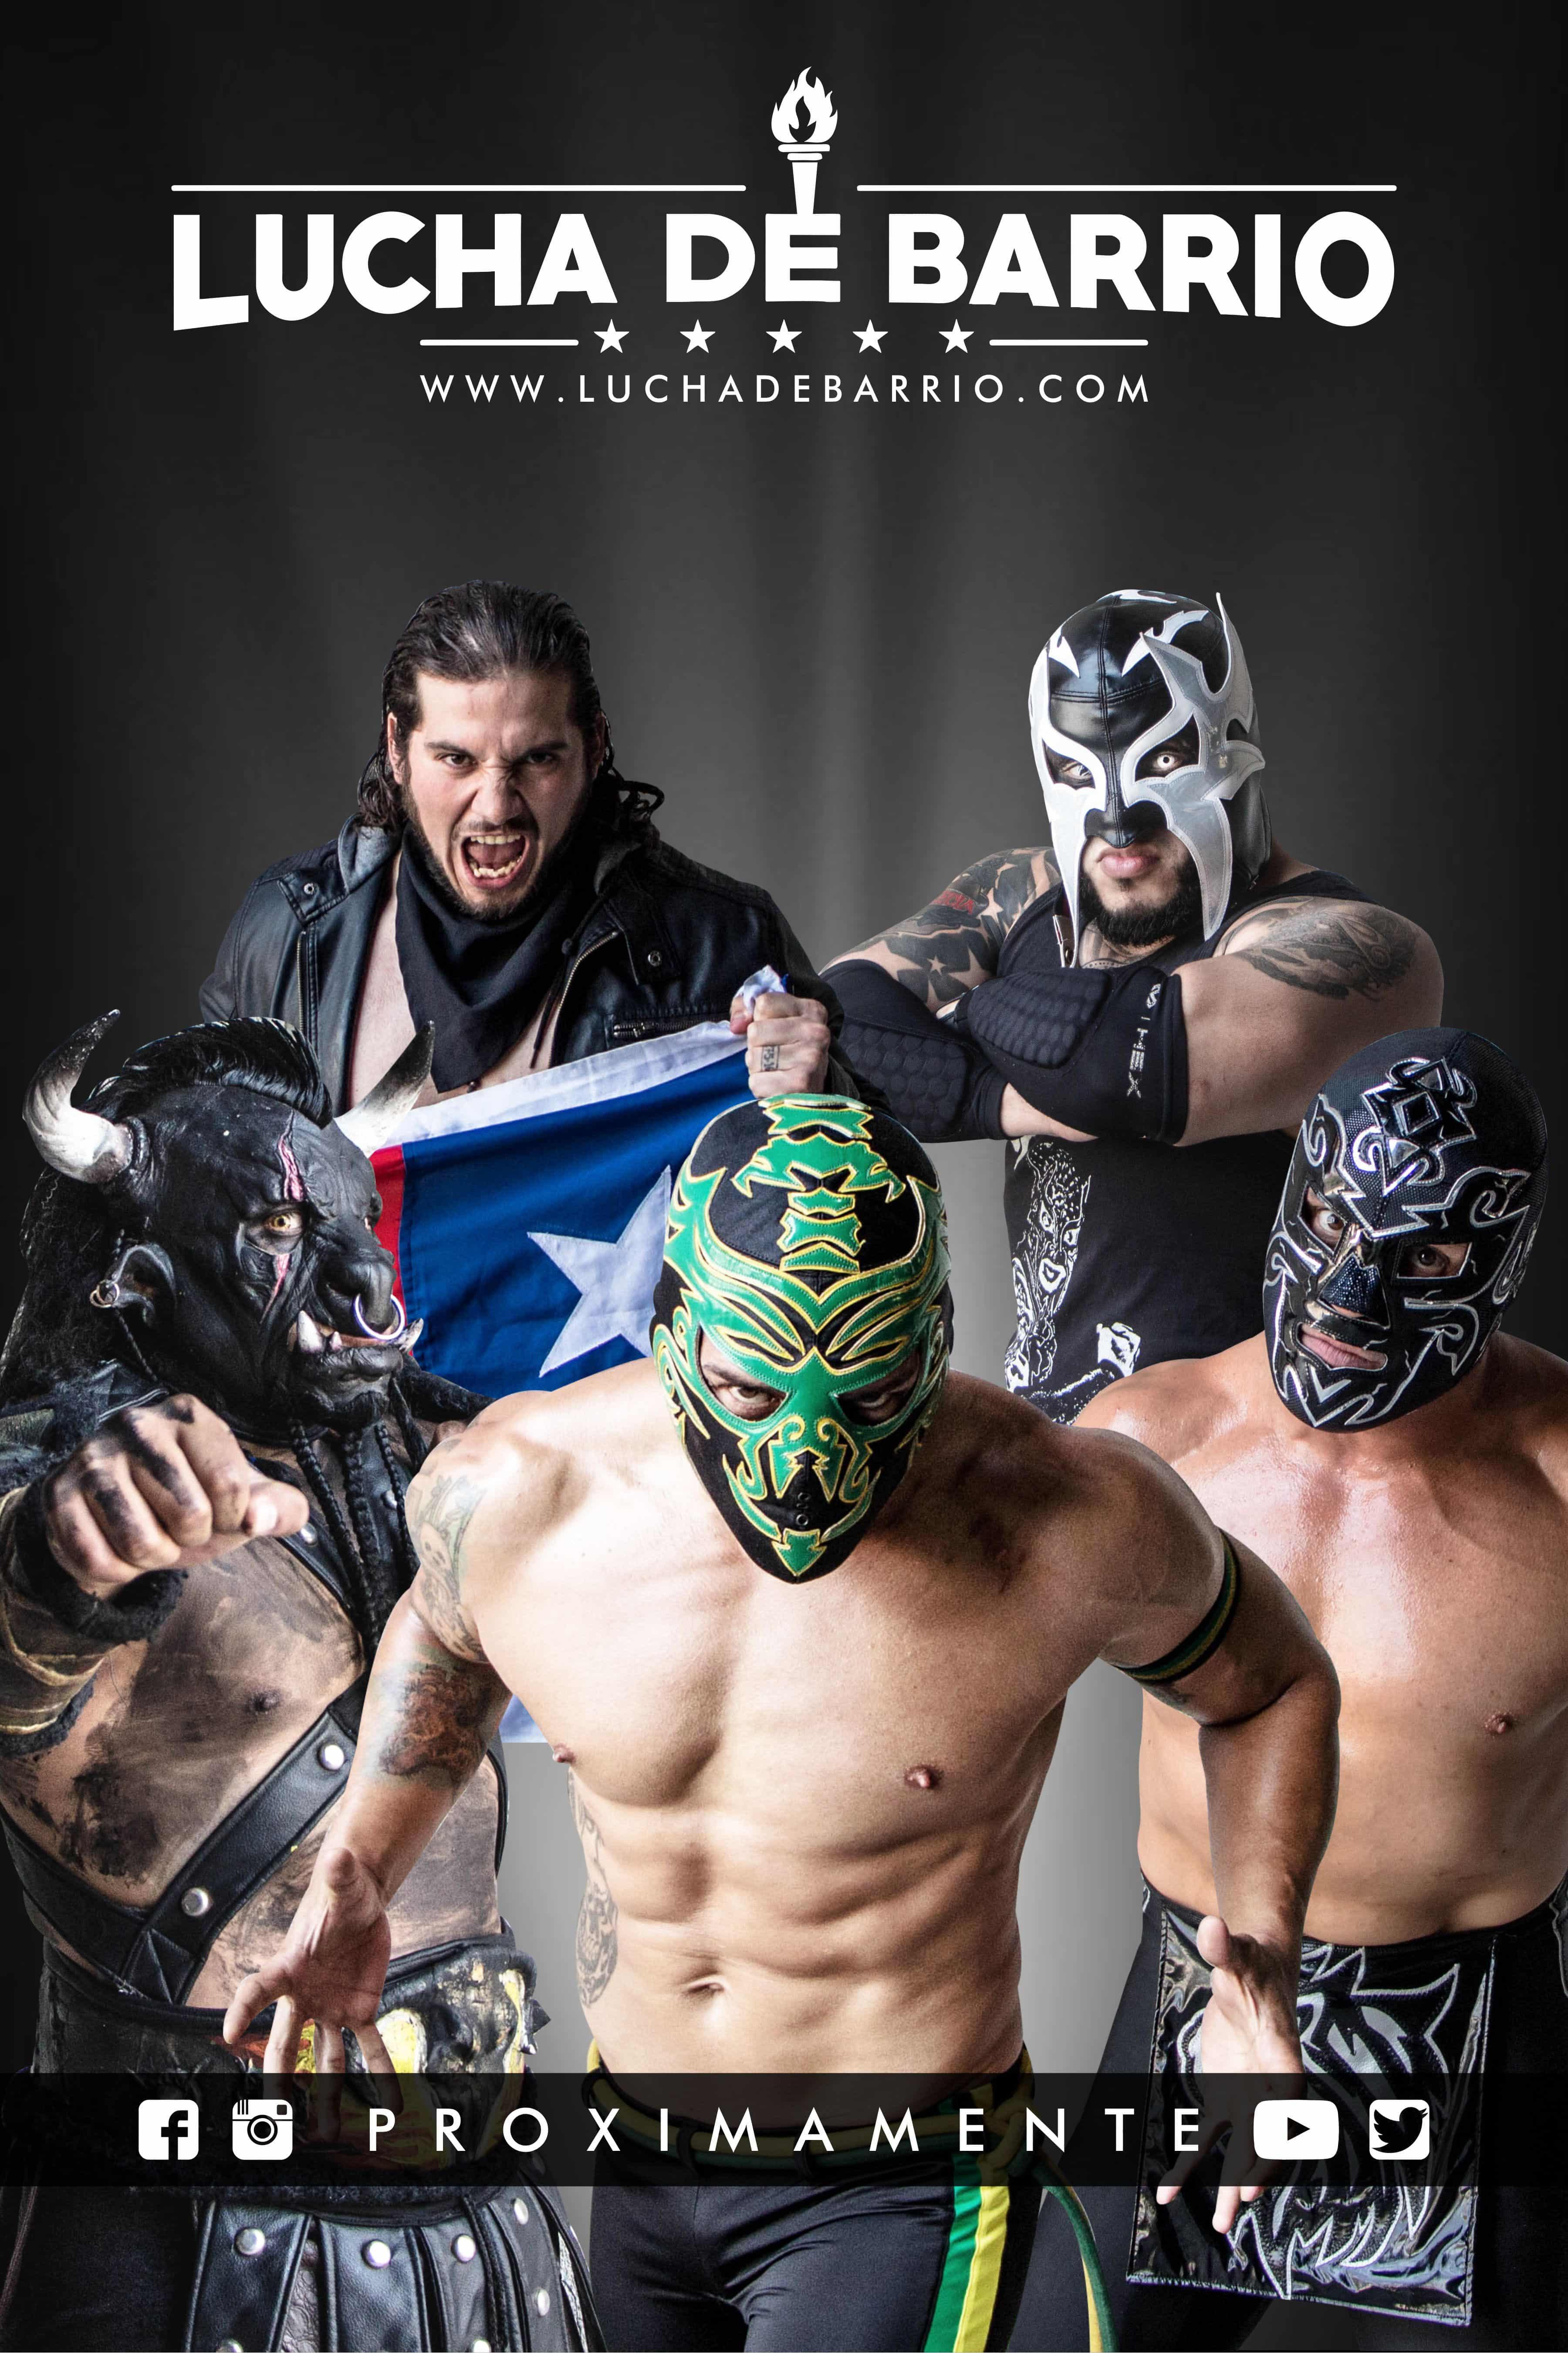 Lucha de Barrio: novedoso concepto en la lucha libre ...